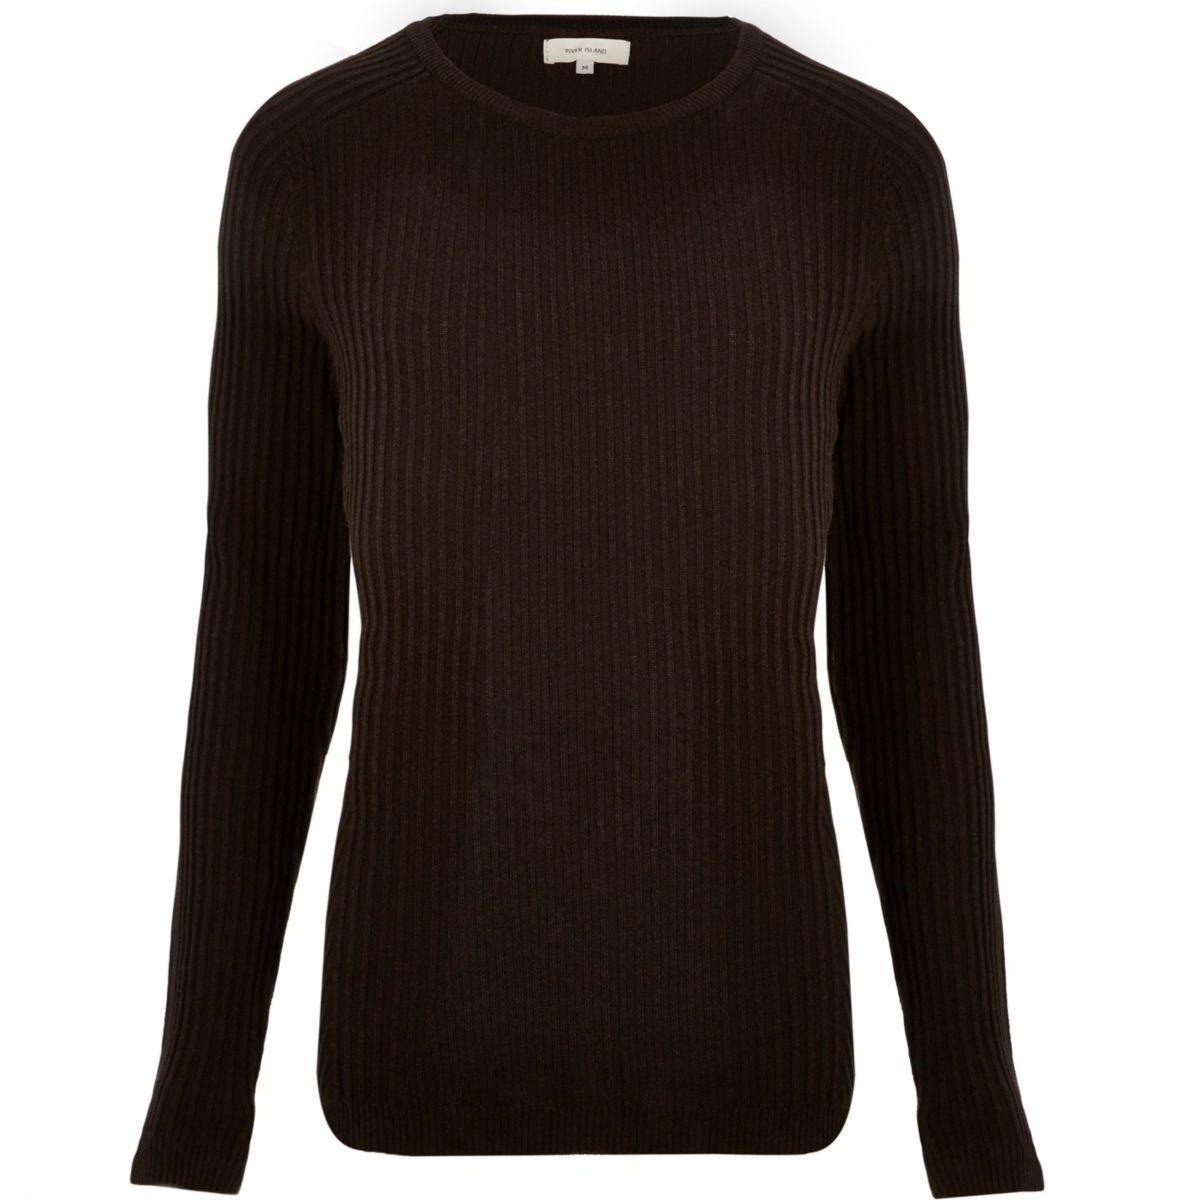 Brown ribbed jumper